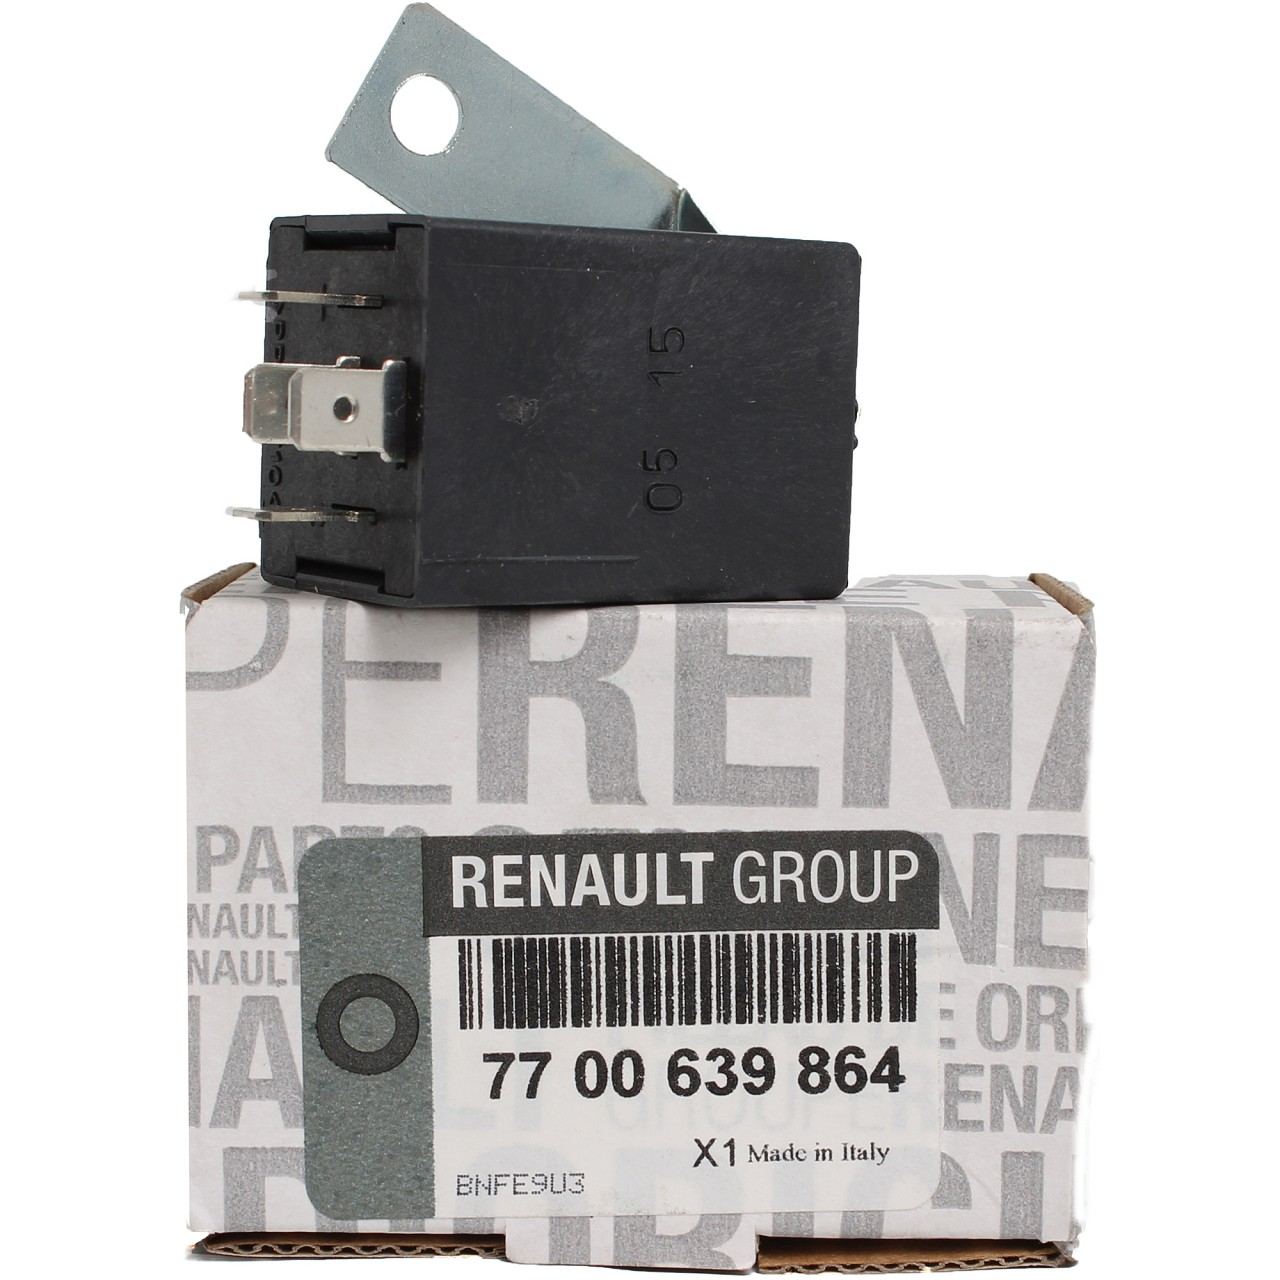 ORIGINAL Renault Blinkgeber Relais Blinkerrelais CLIO ESPACE KANGOO 7700639864